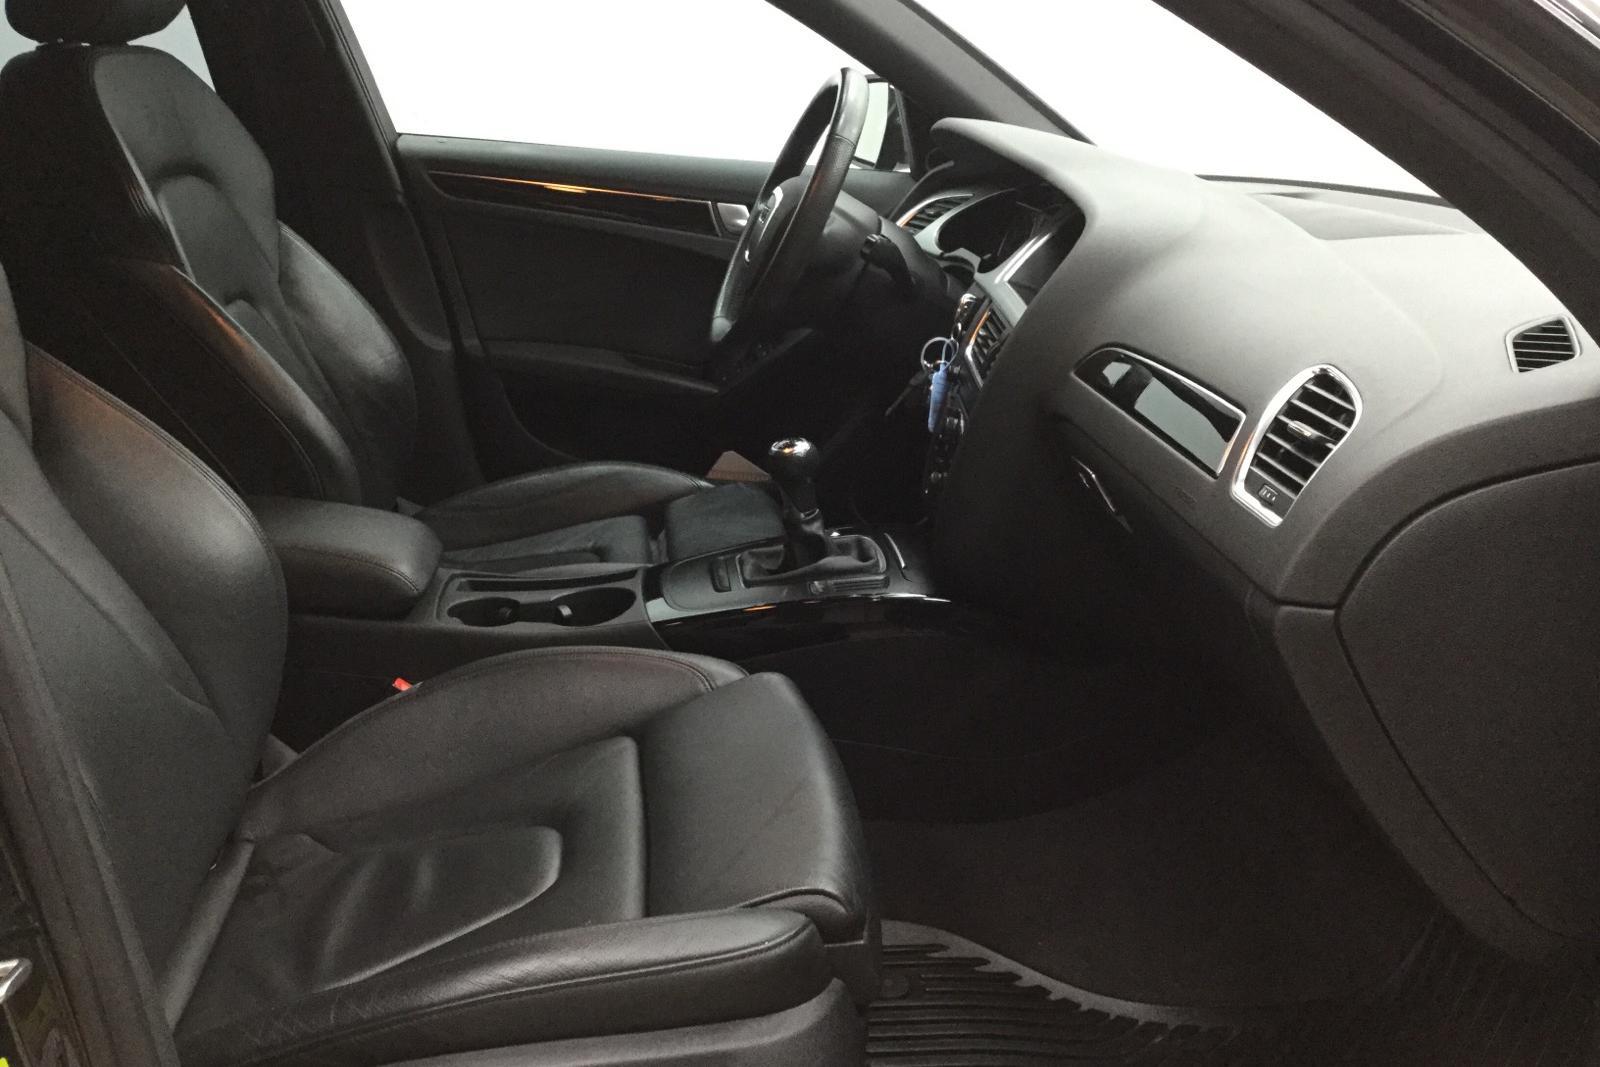 Audi A4 2.0 TFSI (180hk) - 8 400 mil - Manuell - svart - 2010